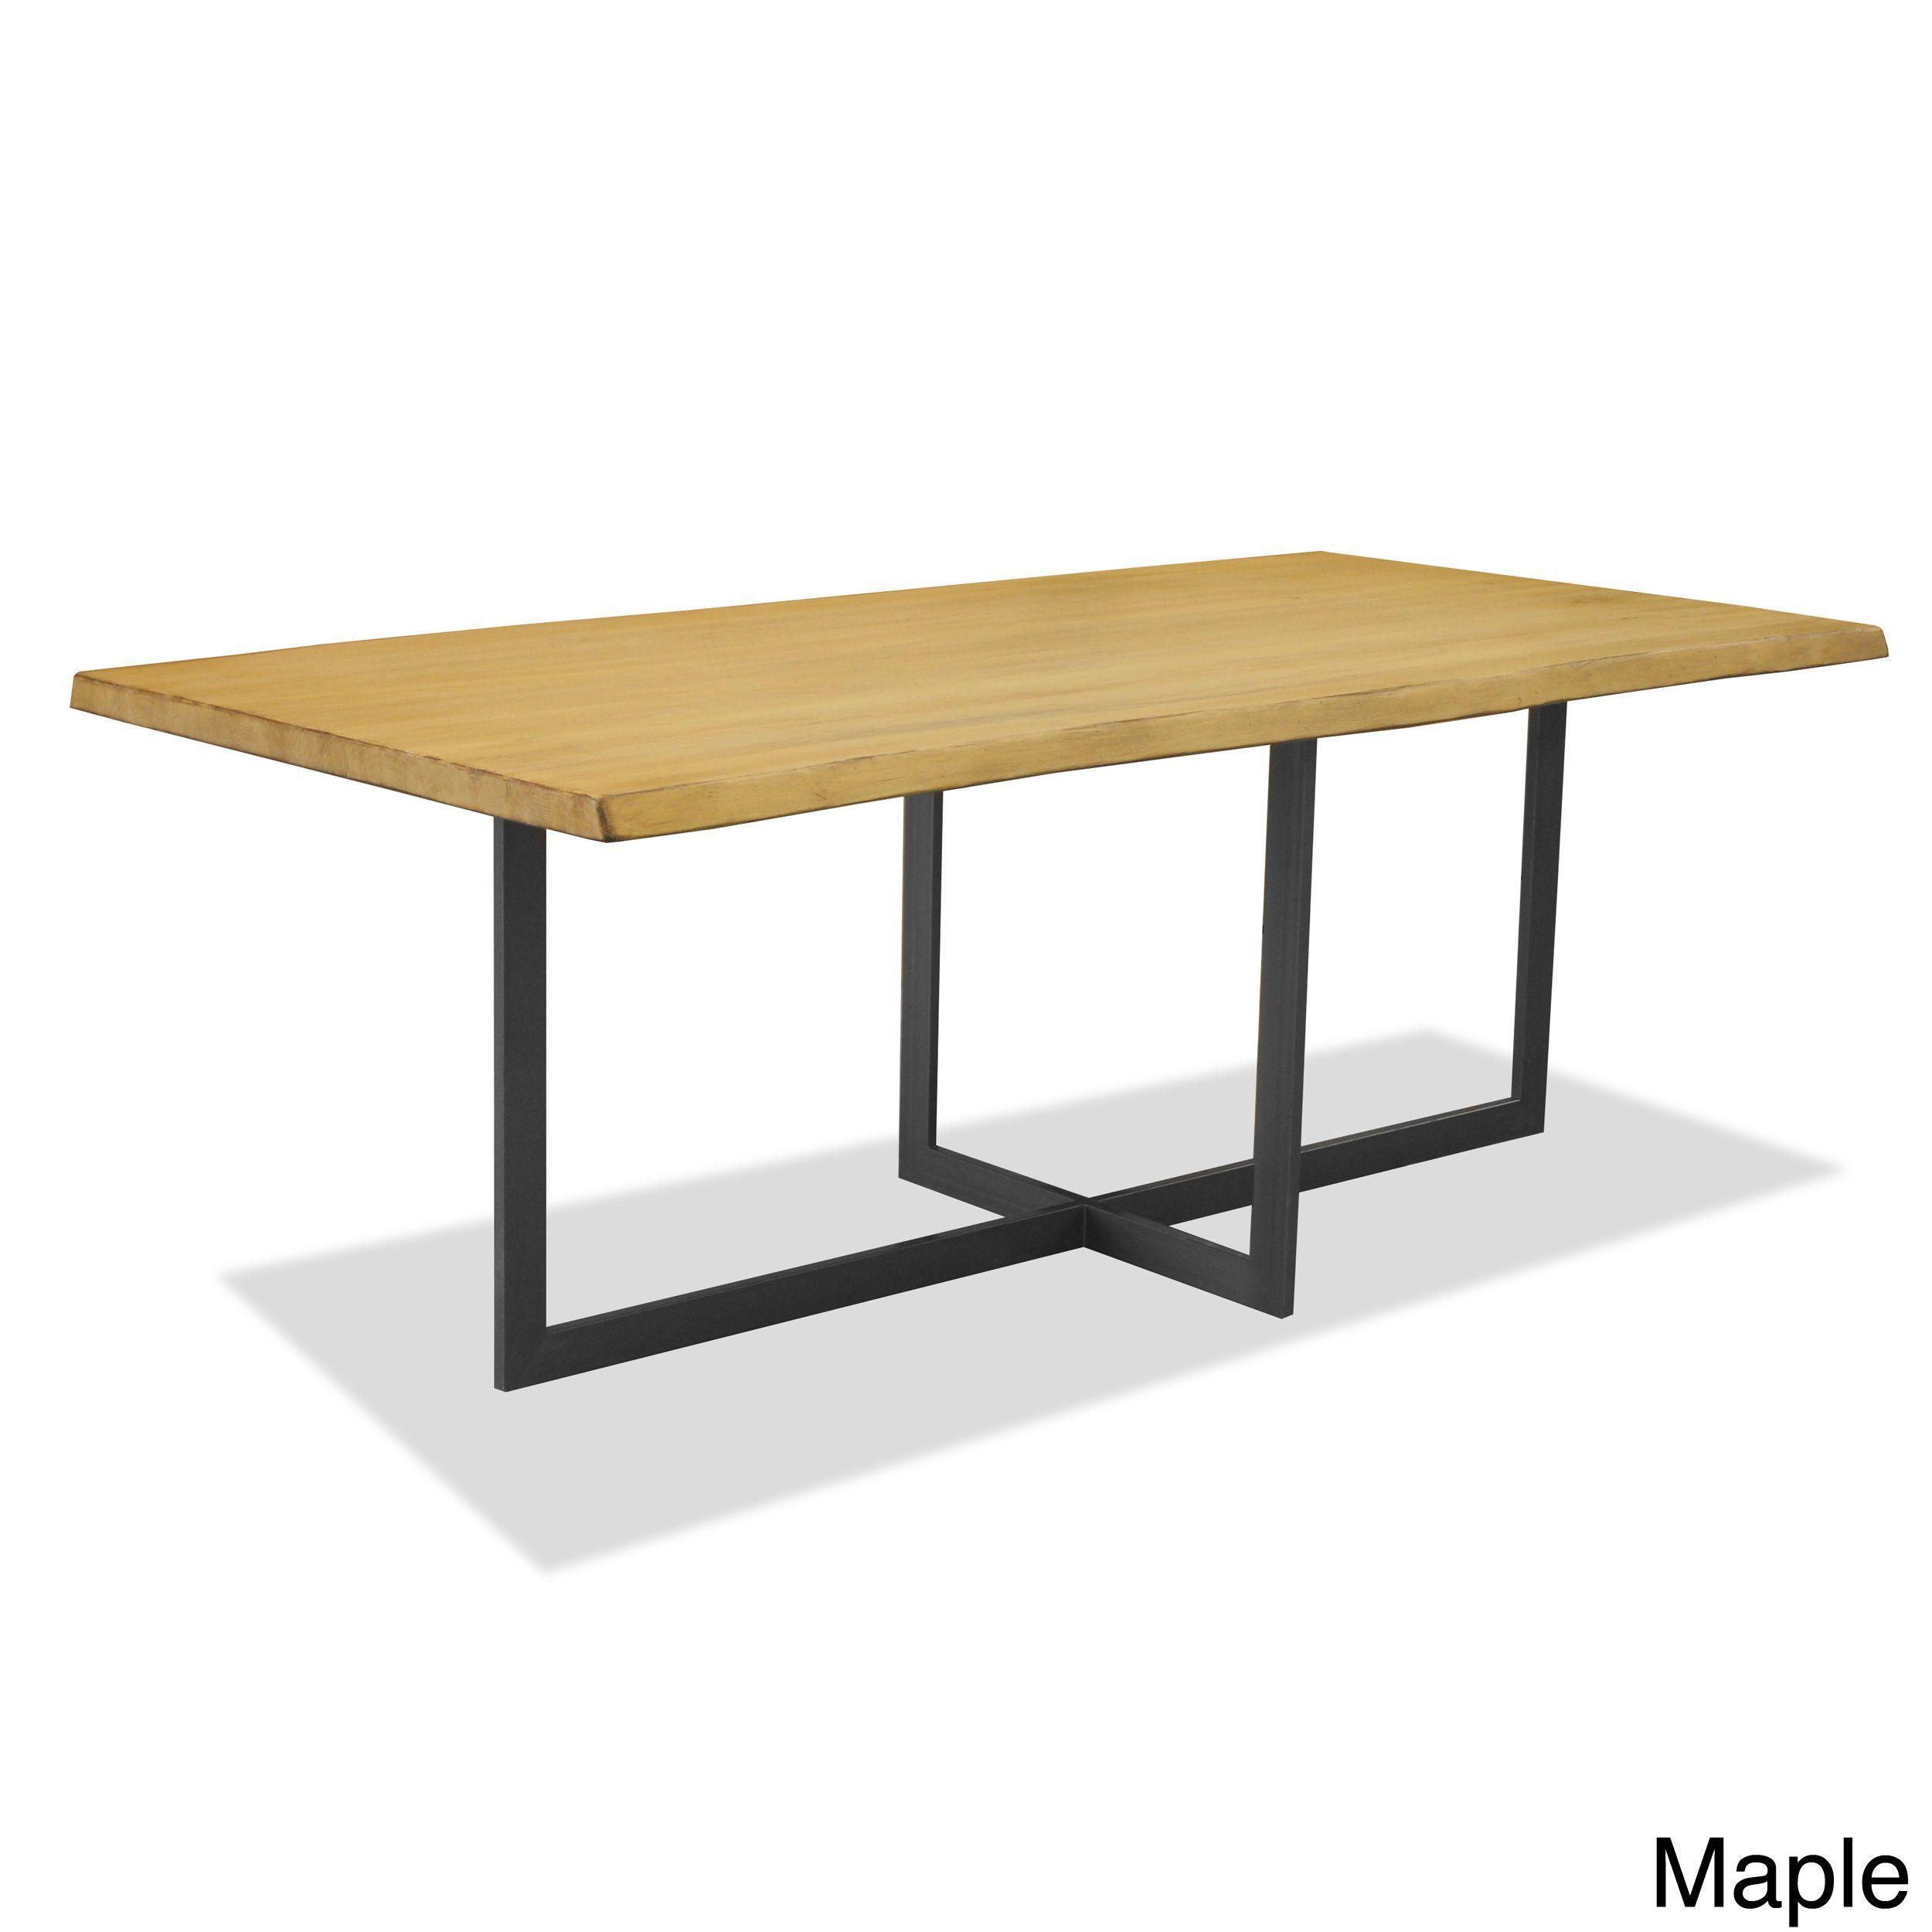 Table basse pinus salon table d/'appoint métal bois Industrial Modern